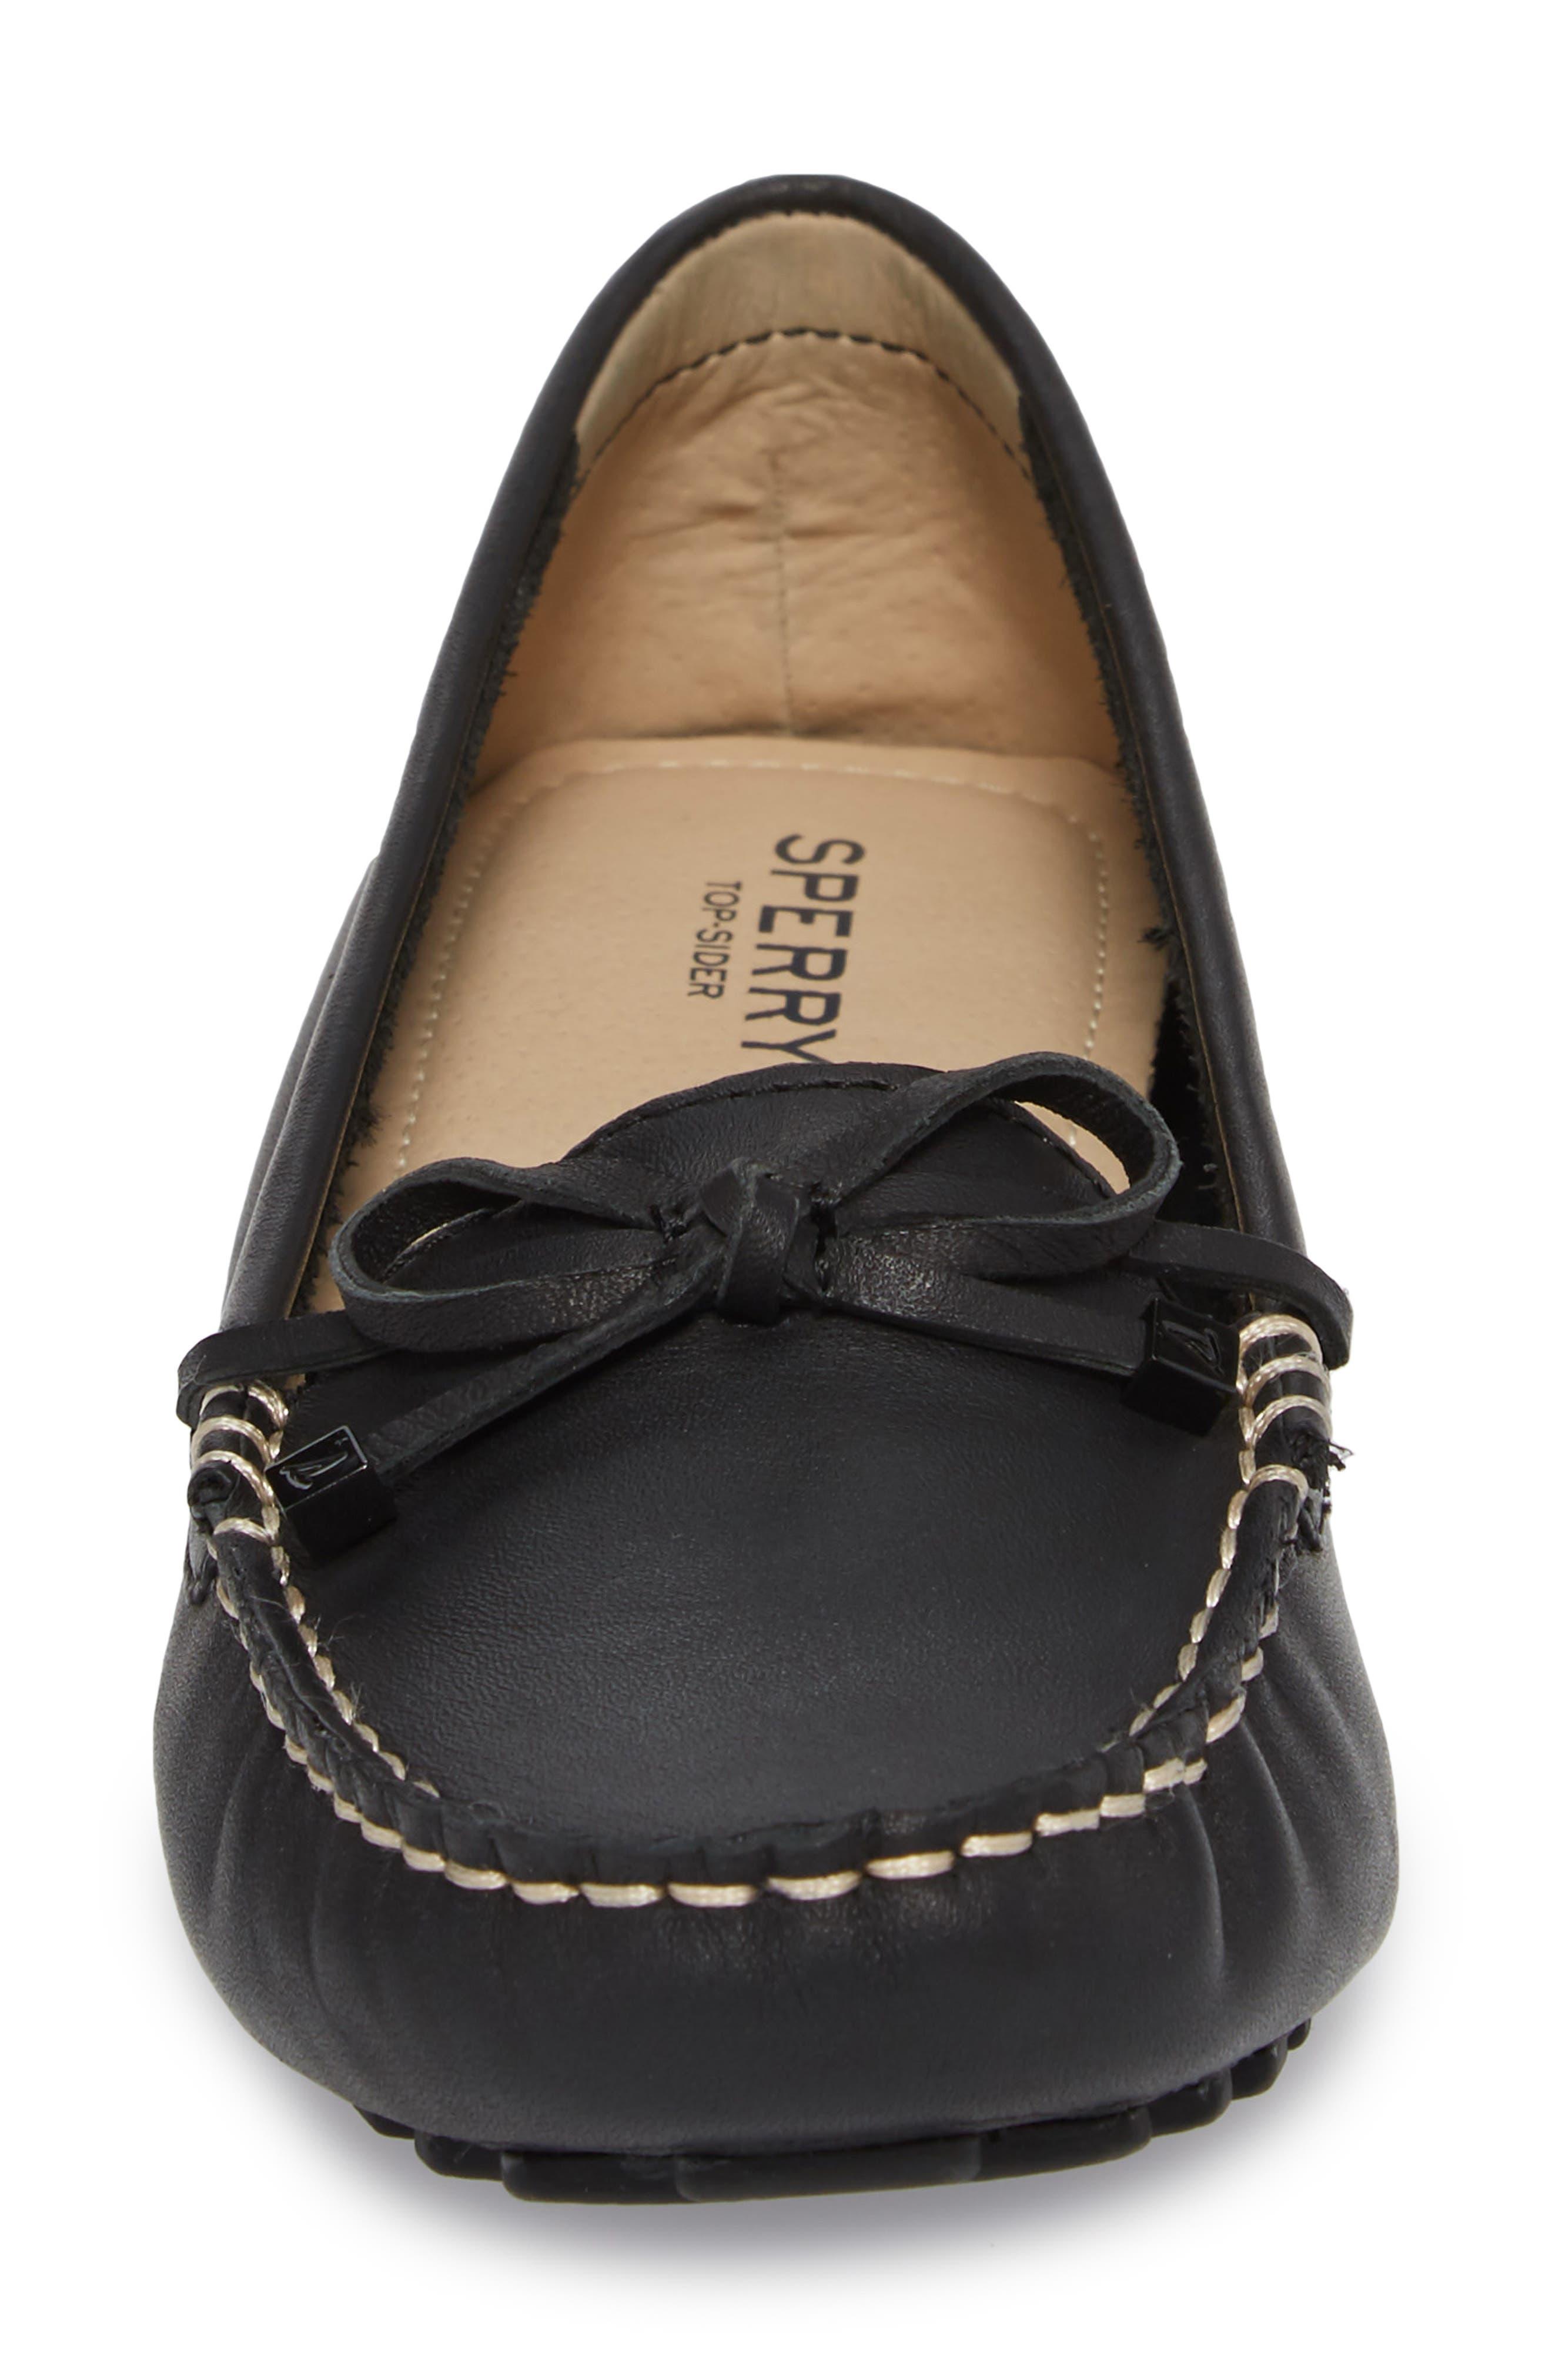 'Katharine' Moc Stitched Loafer,                             Alternate thumbnail 4, color,                             002